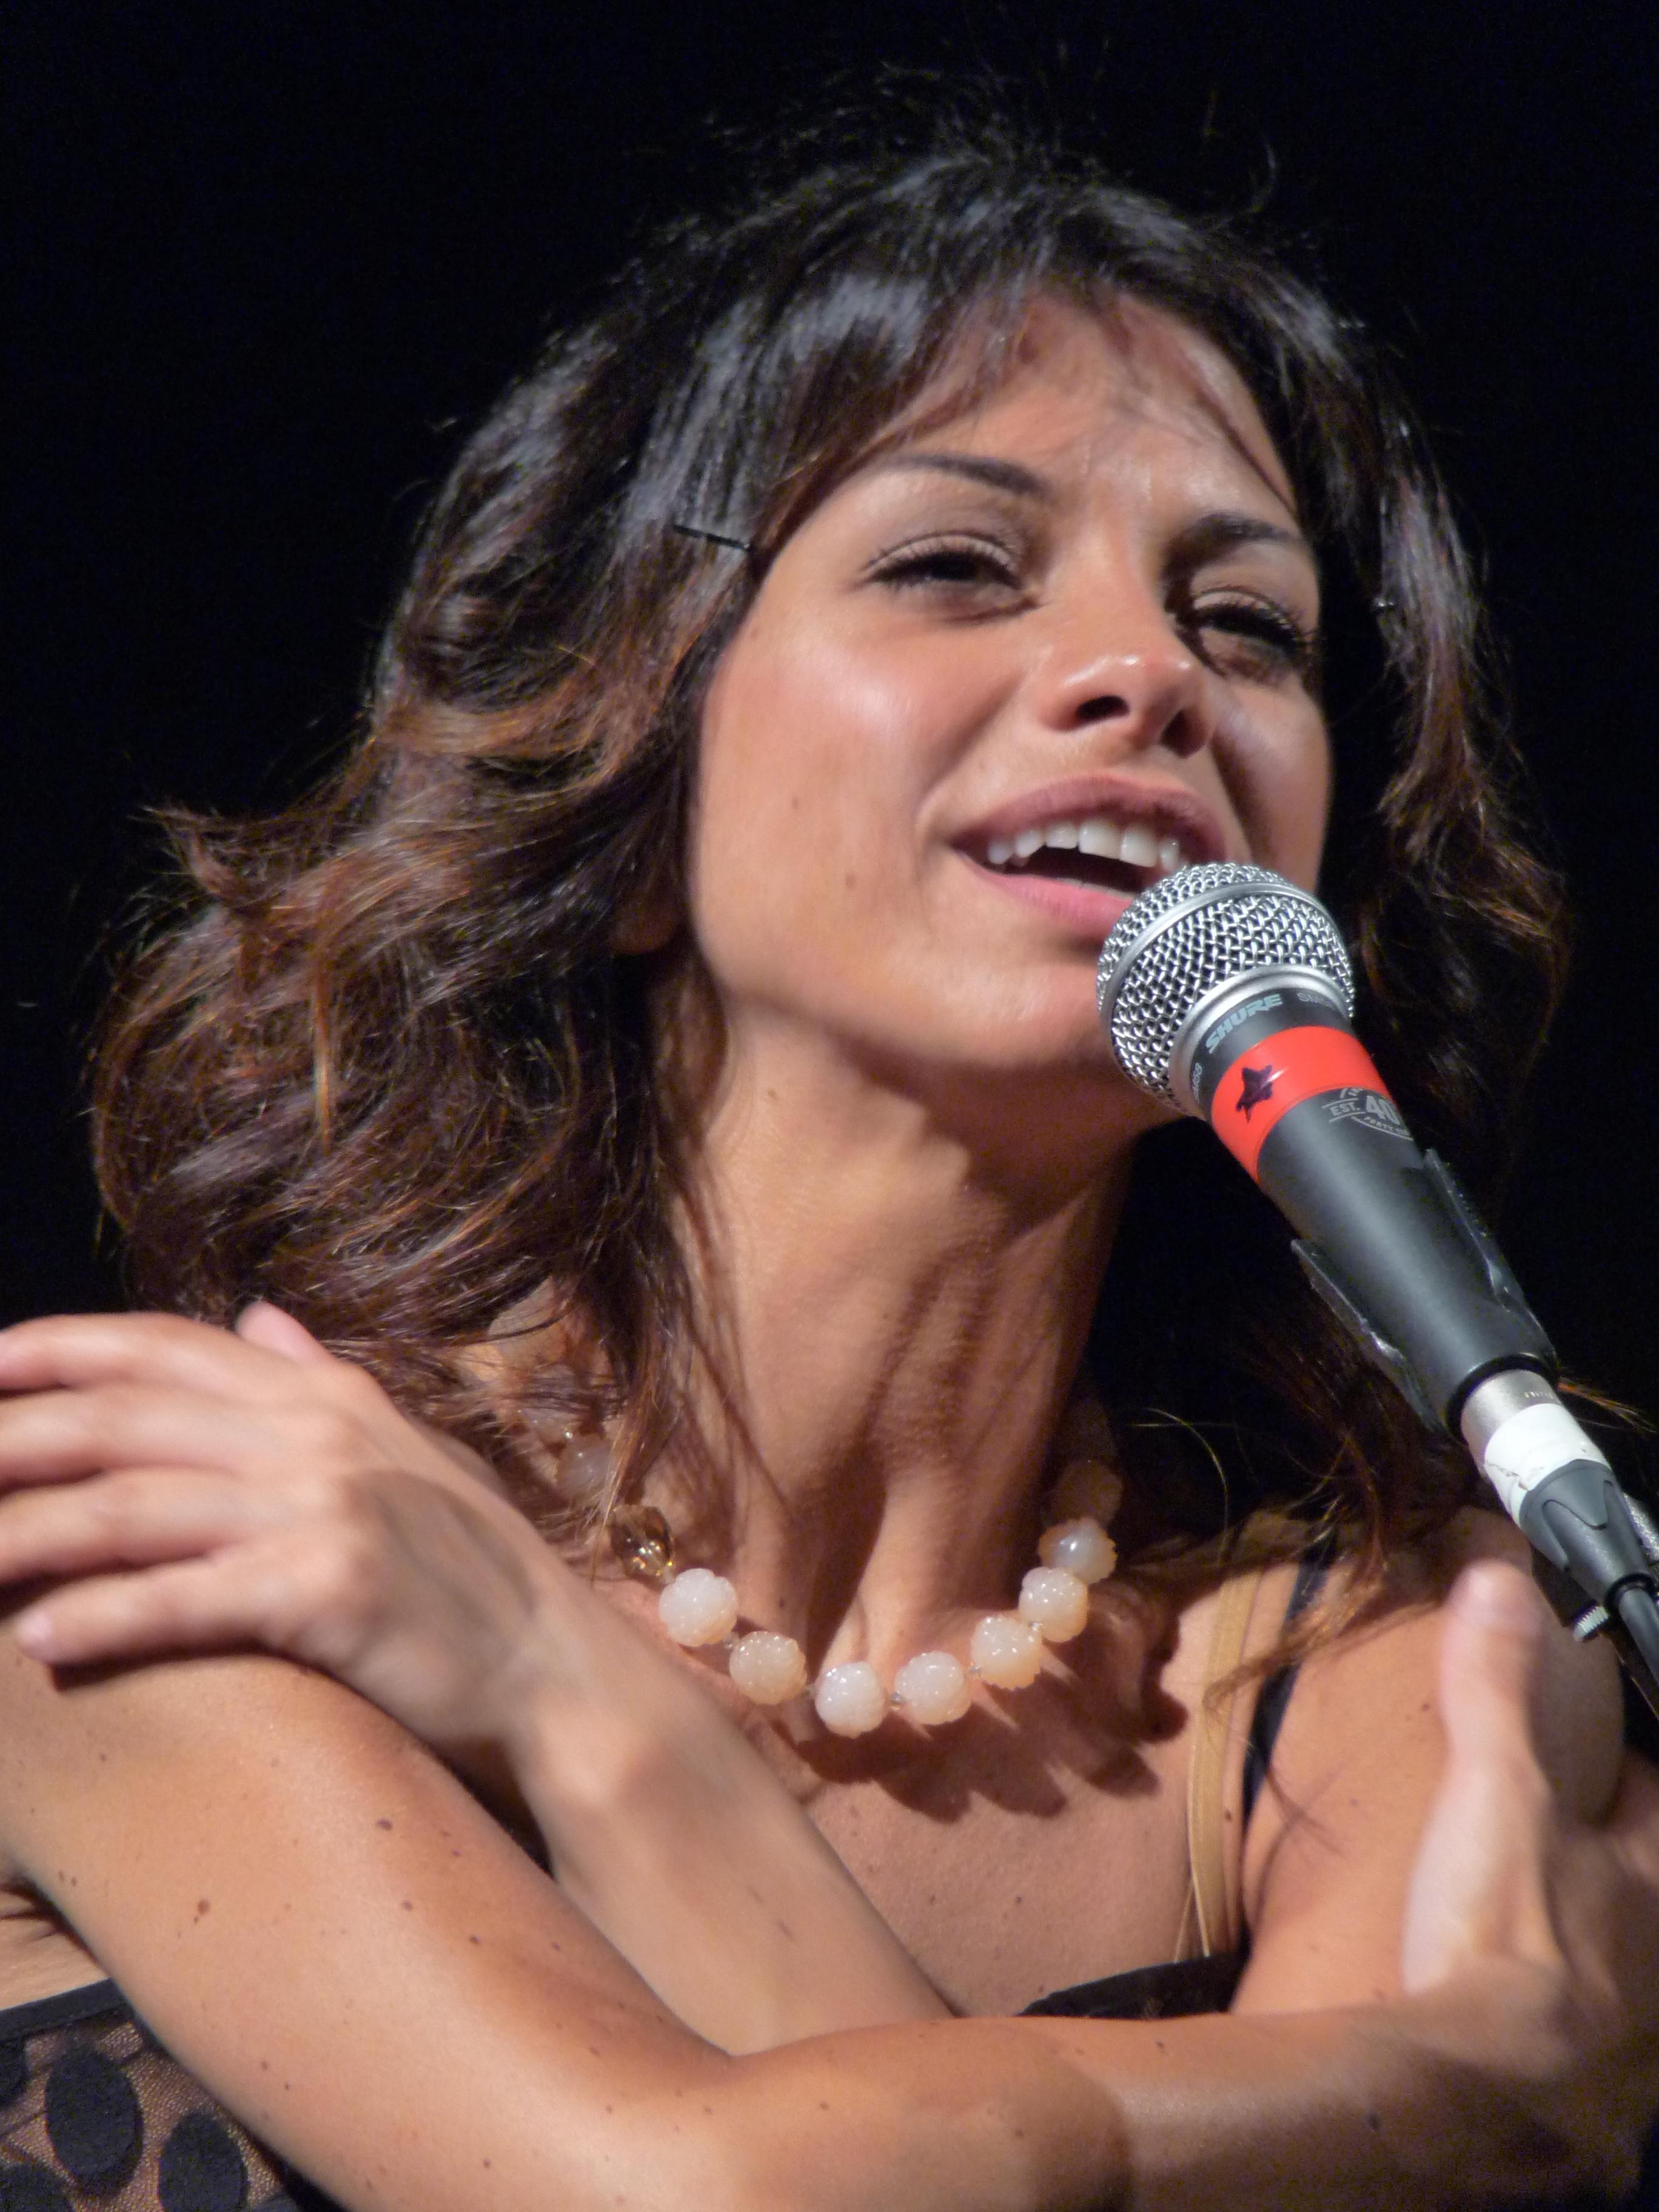 Dolcenera in concerto a Sanremo 2009.